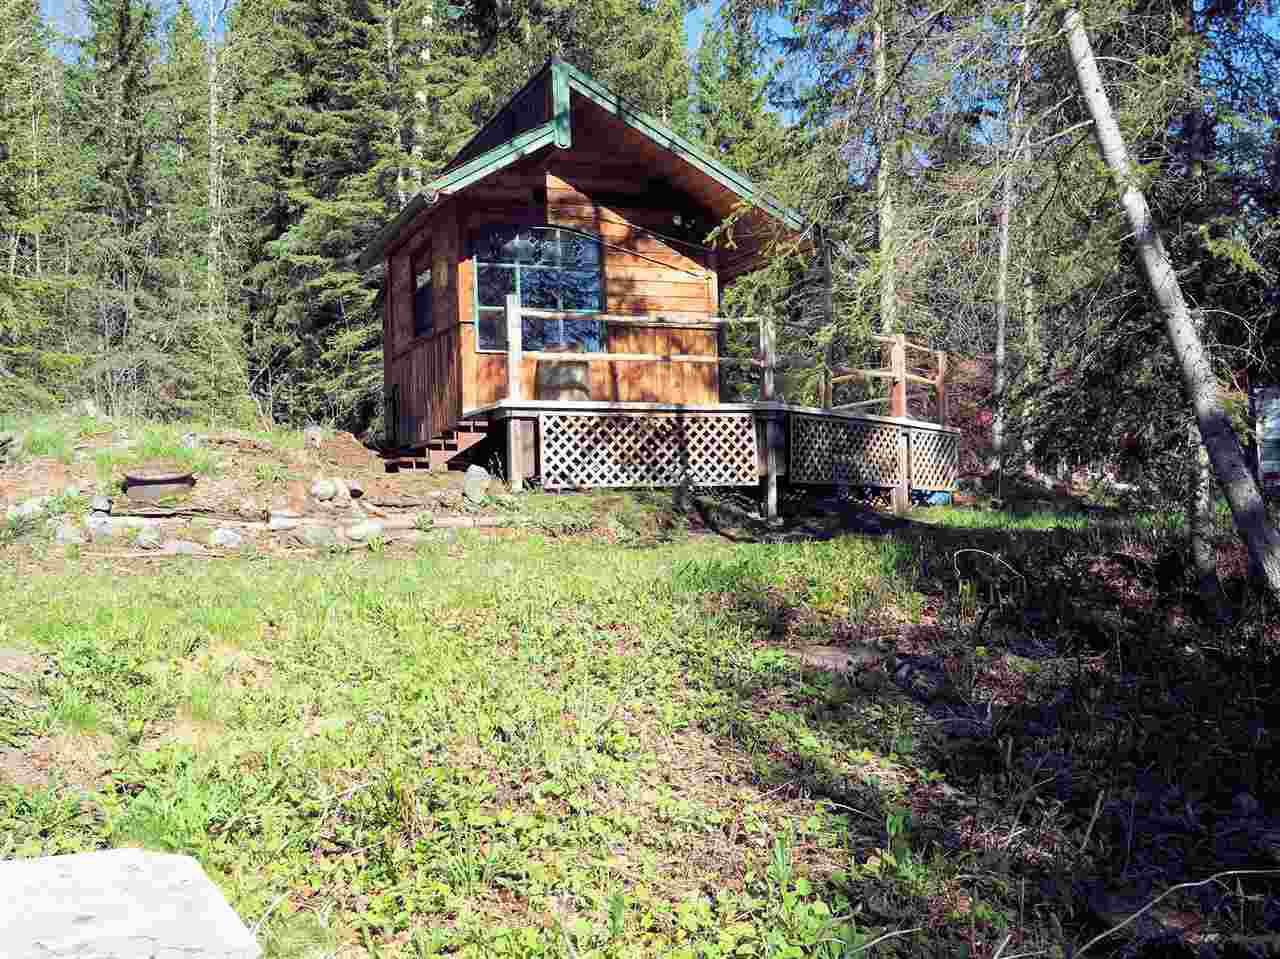 Photo 9: Photos: 8222 CENTENNIAL Road in Bridge Lake: Bridge Lake/Sheridan Lake House for sale (100 Mile House (Zone 10))  : MLS®# R2457362